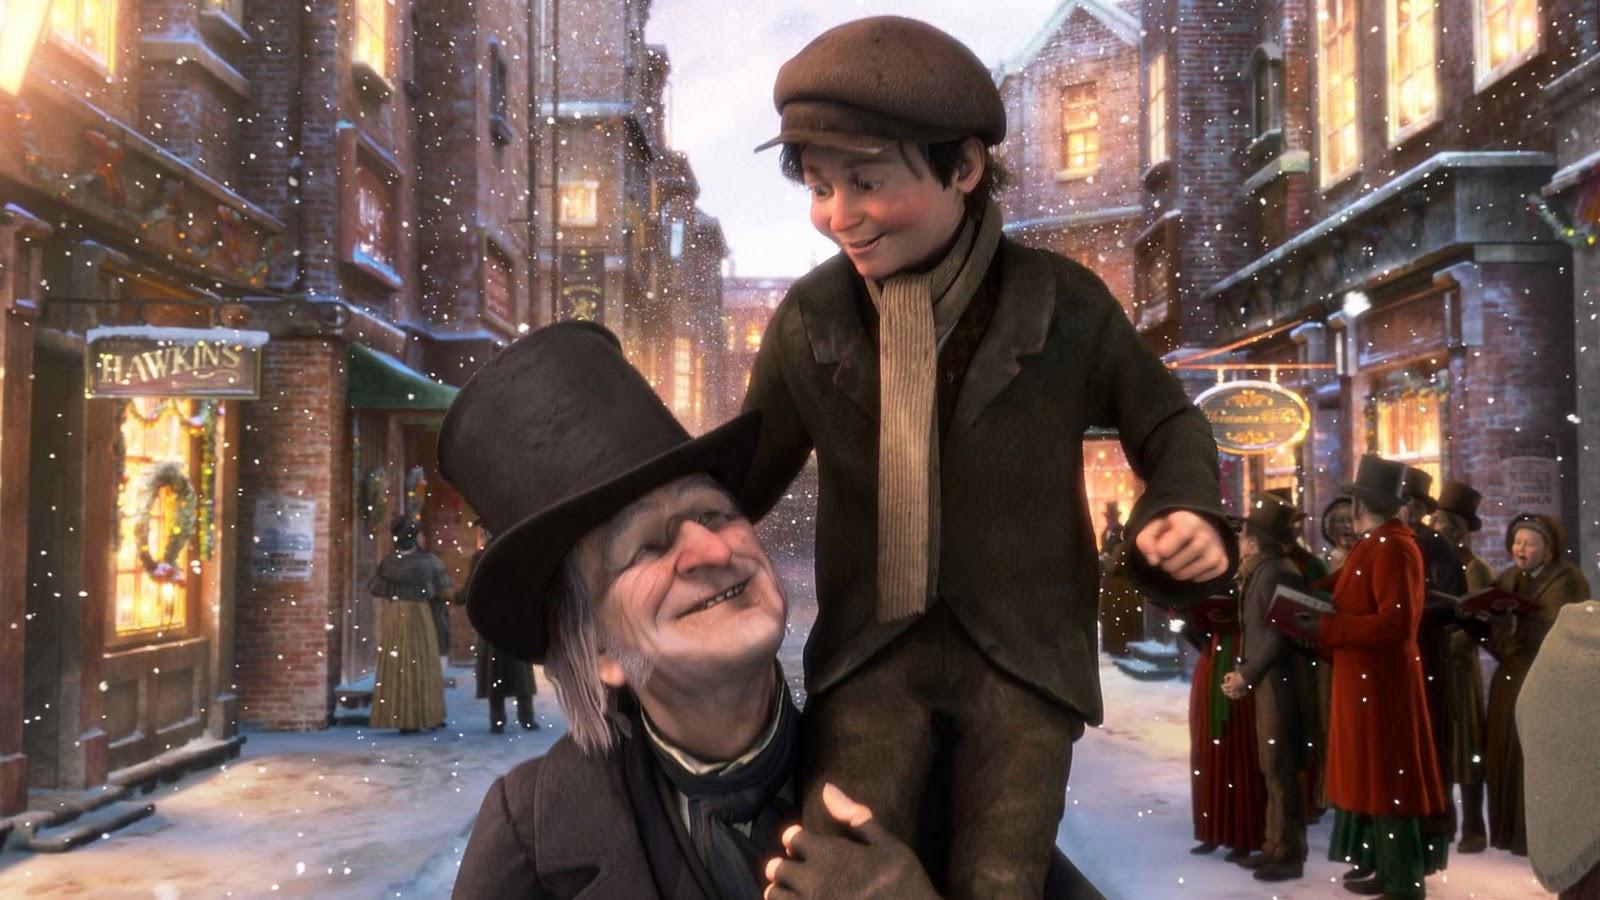 25 Reviews of Christmas #5 - Robert Zemeckis and Jim Carrey craft a ...